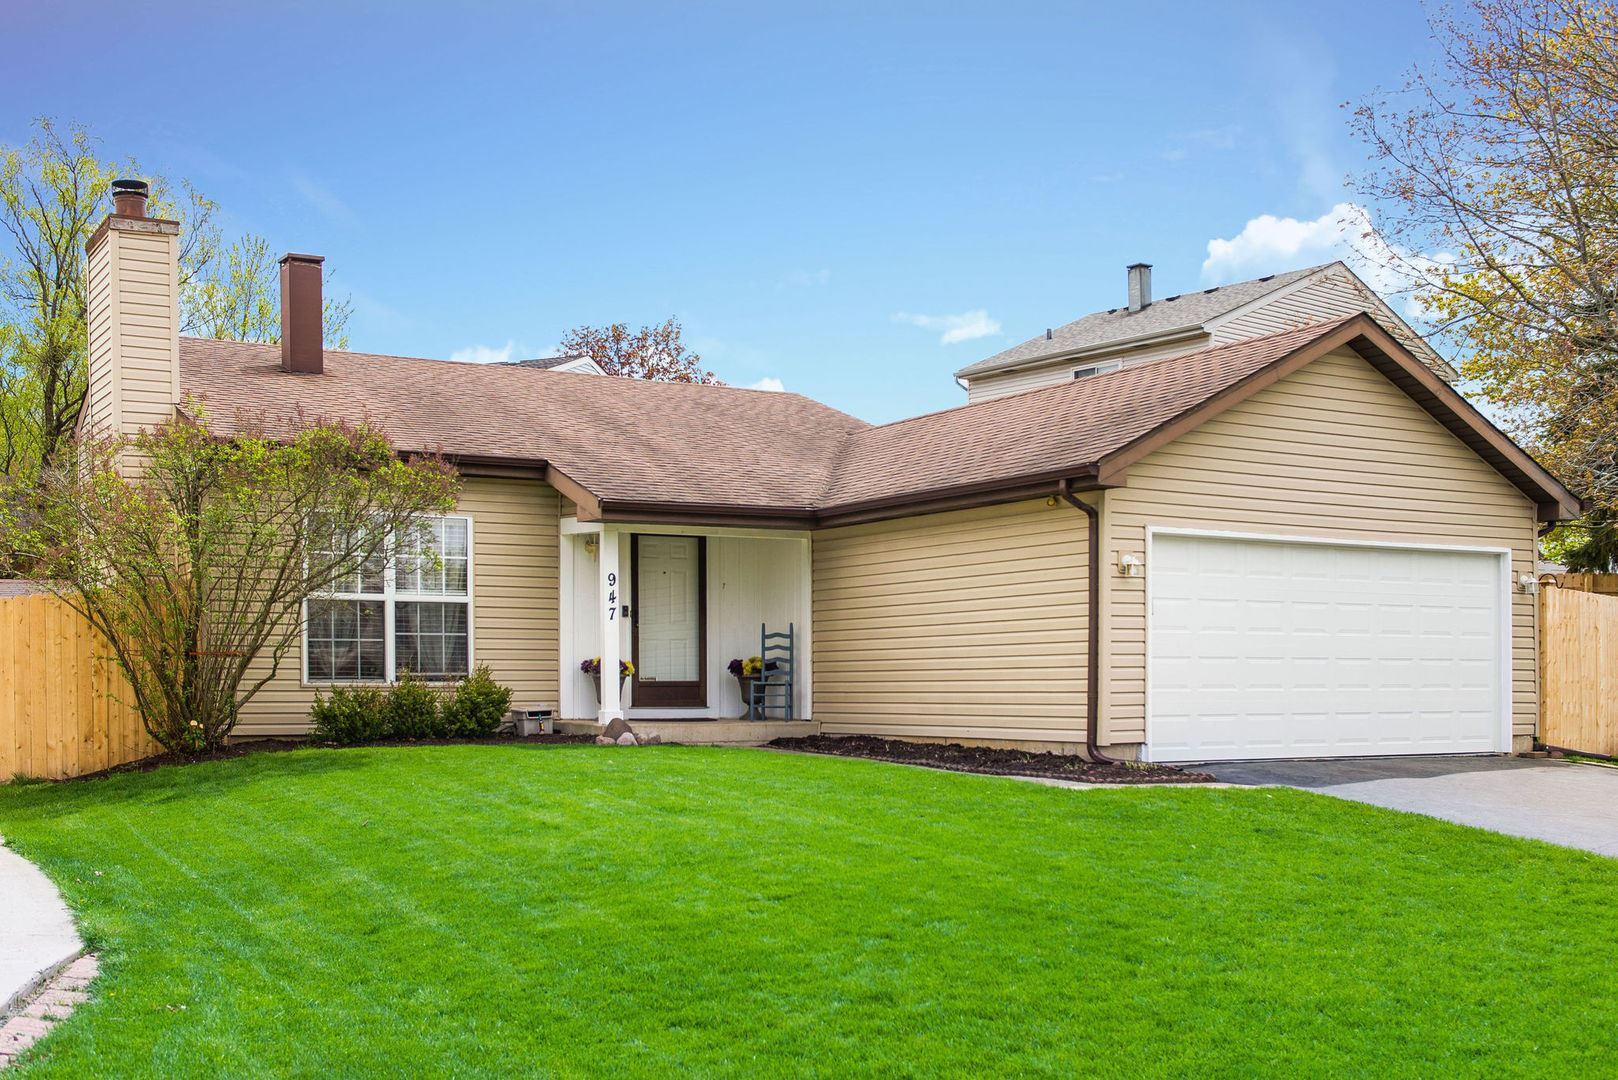 947 Aspen Drive, Lombard, IL 60148 - #: 10704545